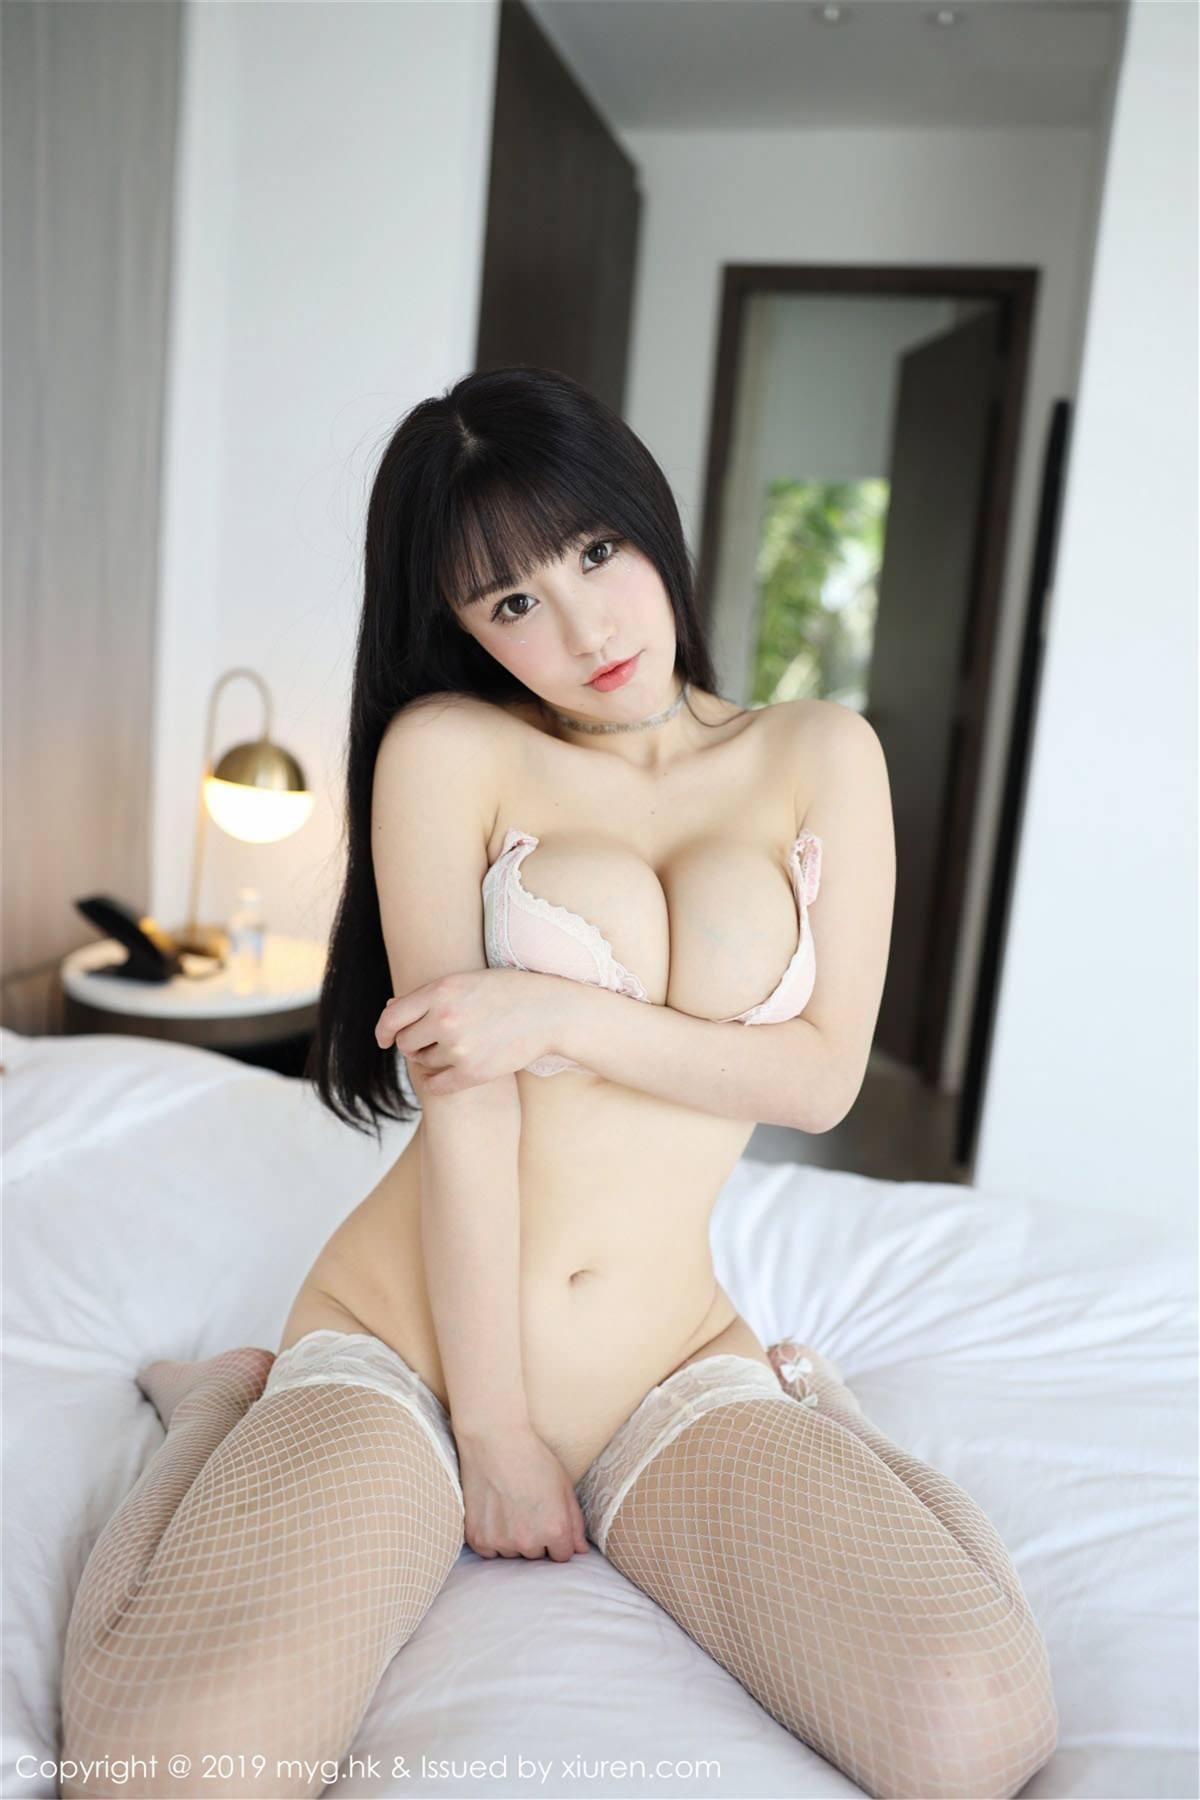 MyGirl Vol.364 44P, mygirl, Zhu Ke Er